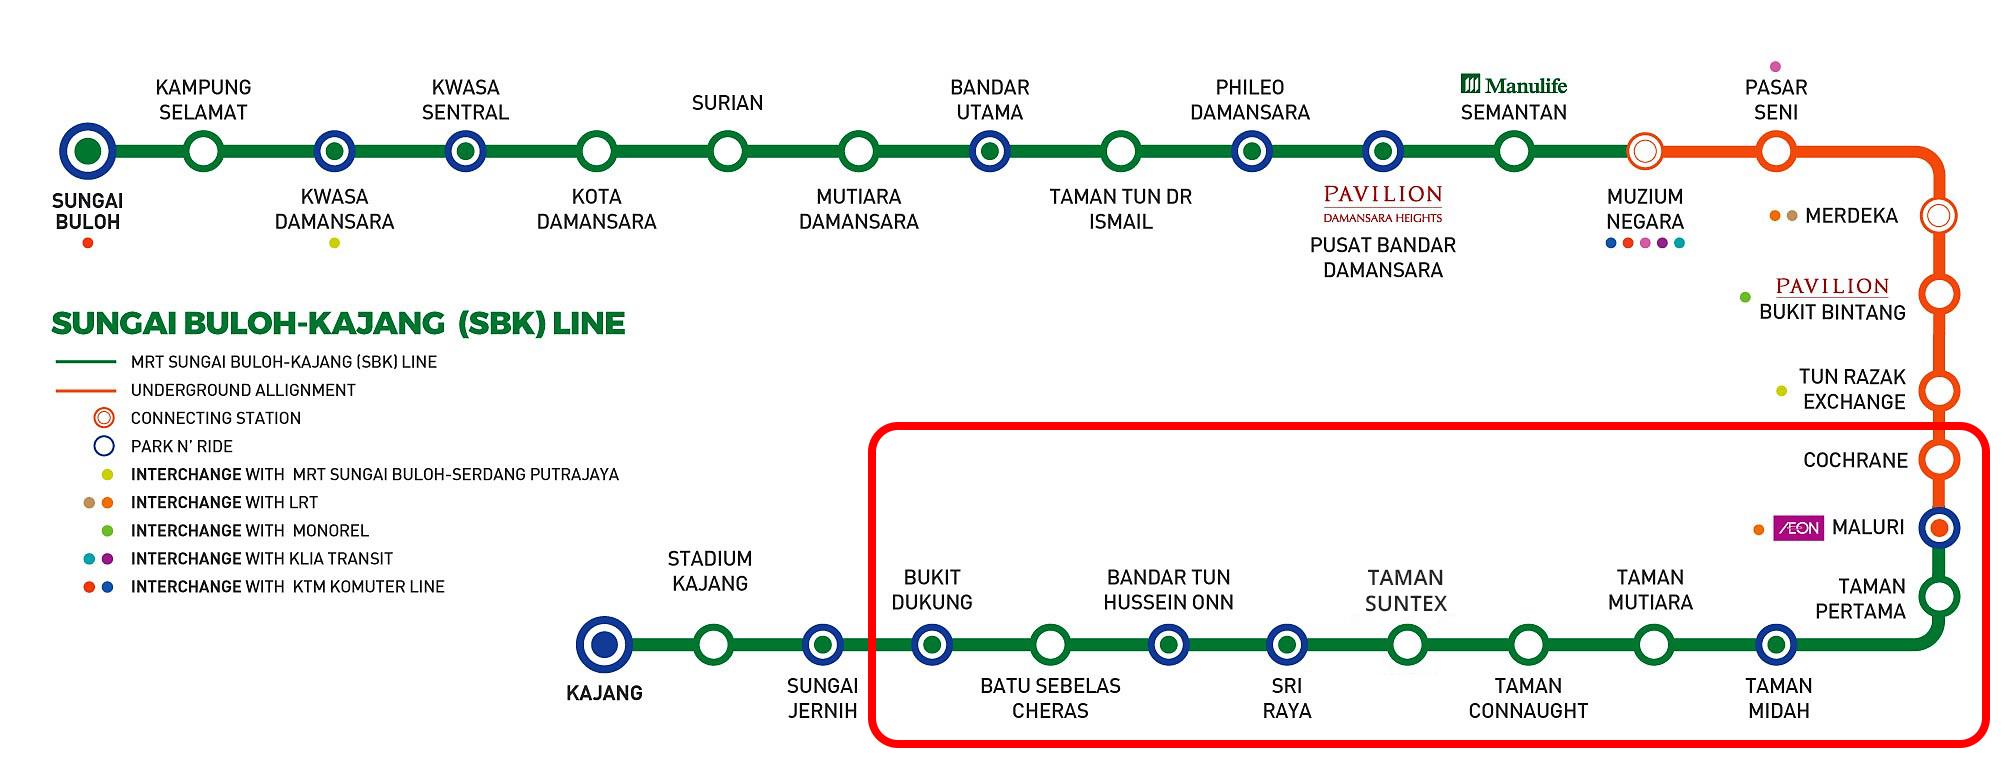 Mrt-Line-1-stations-1-copy